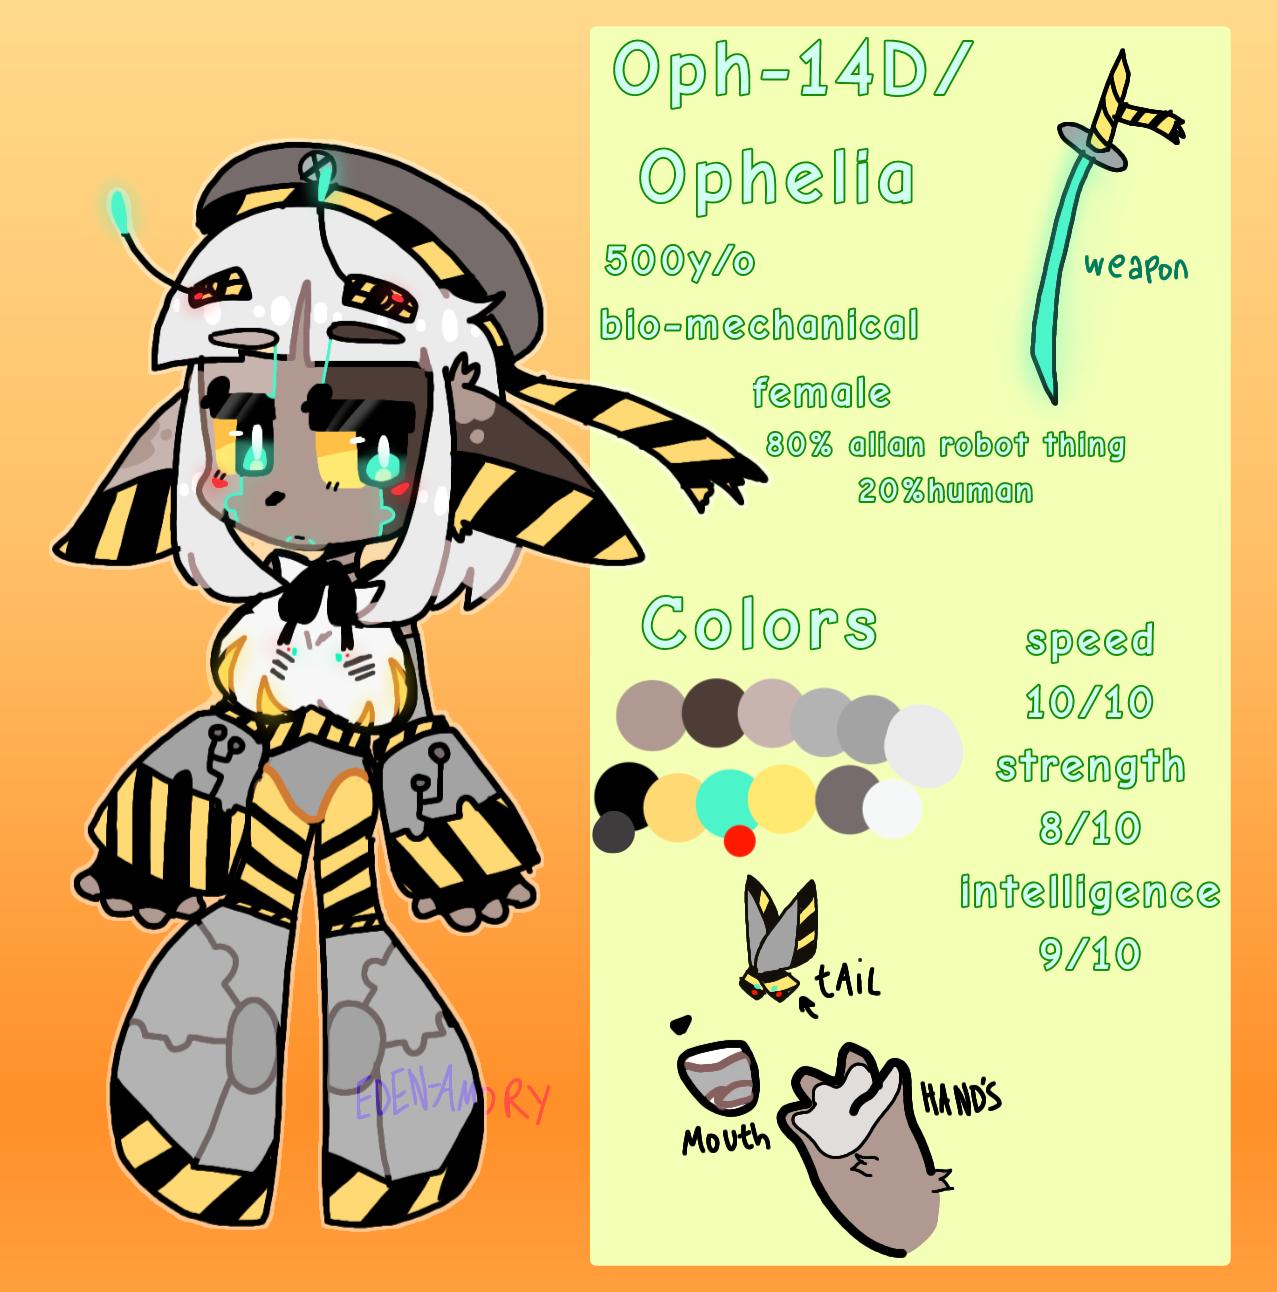 Meet Ophelia